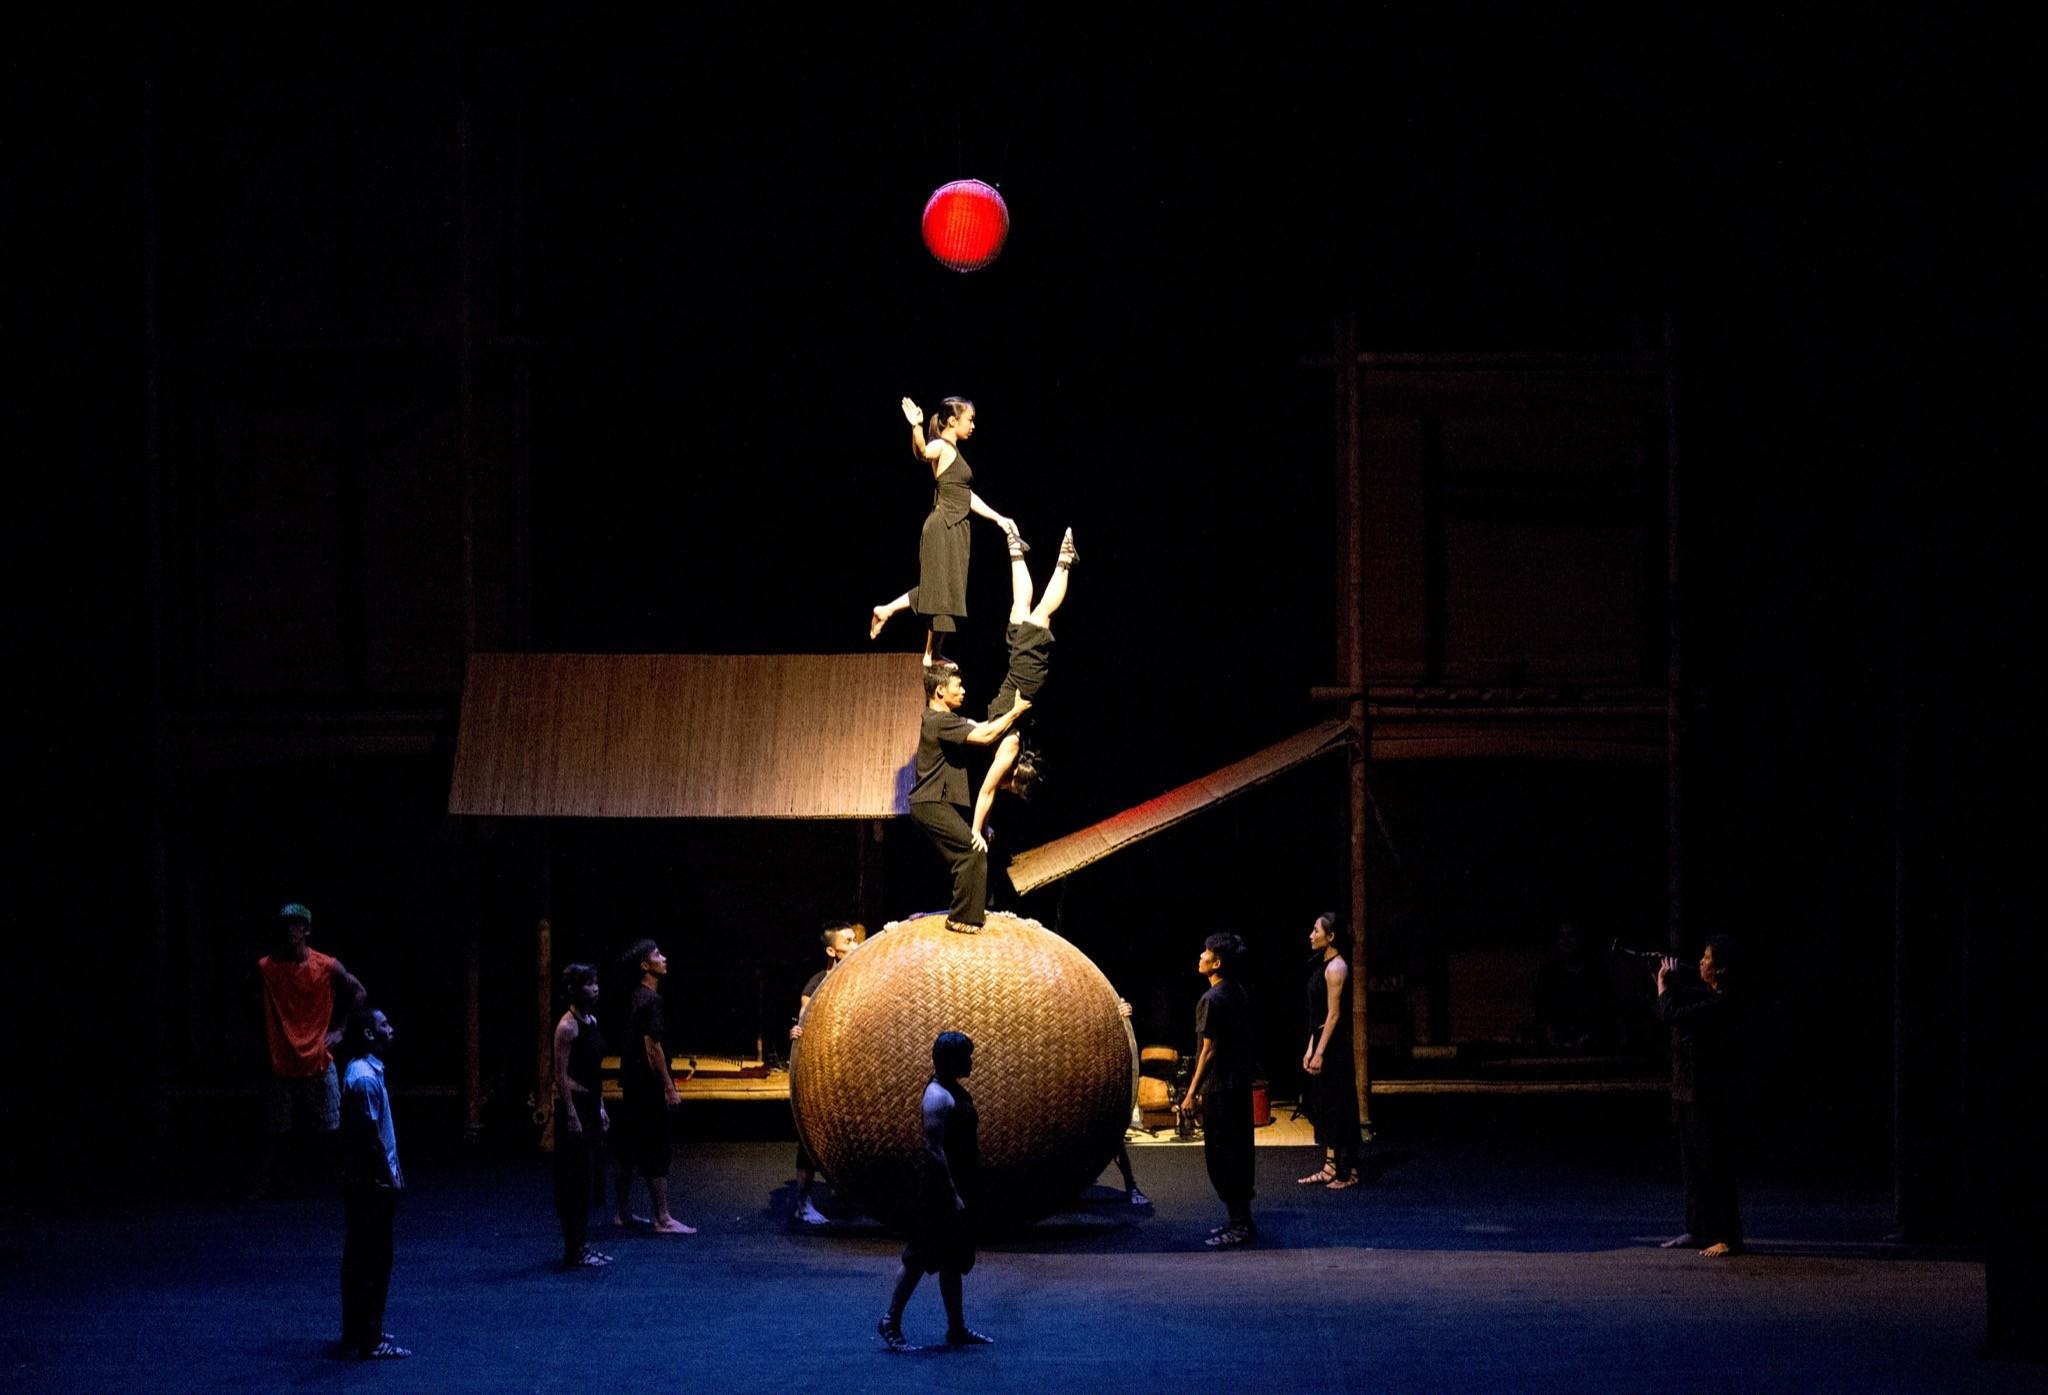 100%-Aolangpho 2 - cirque Vietnam - (C) Nguyen The Duong